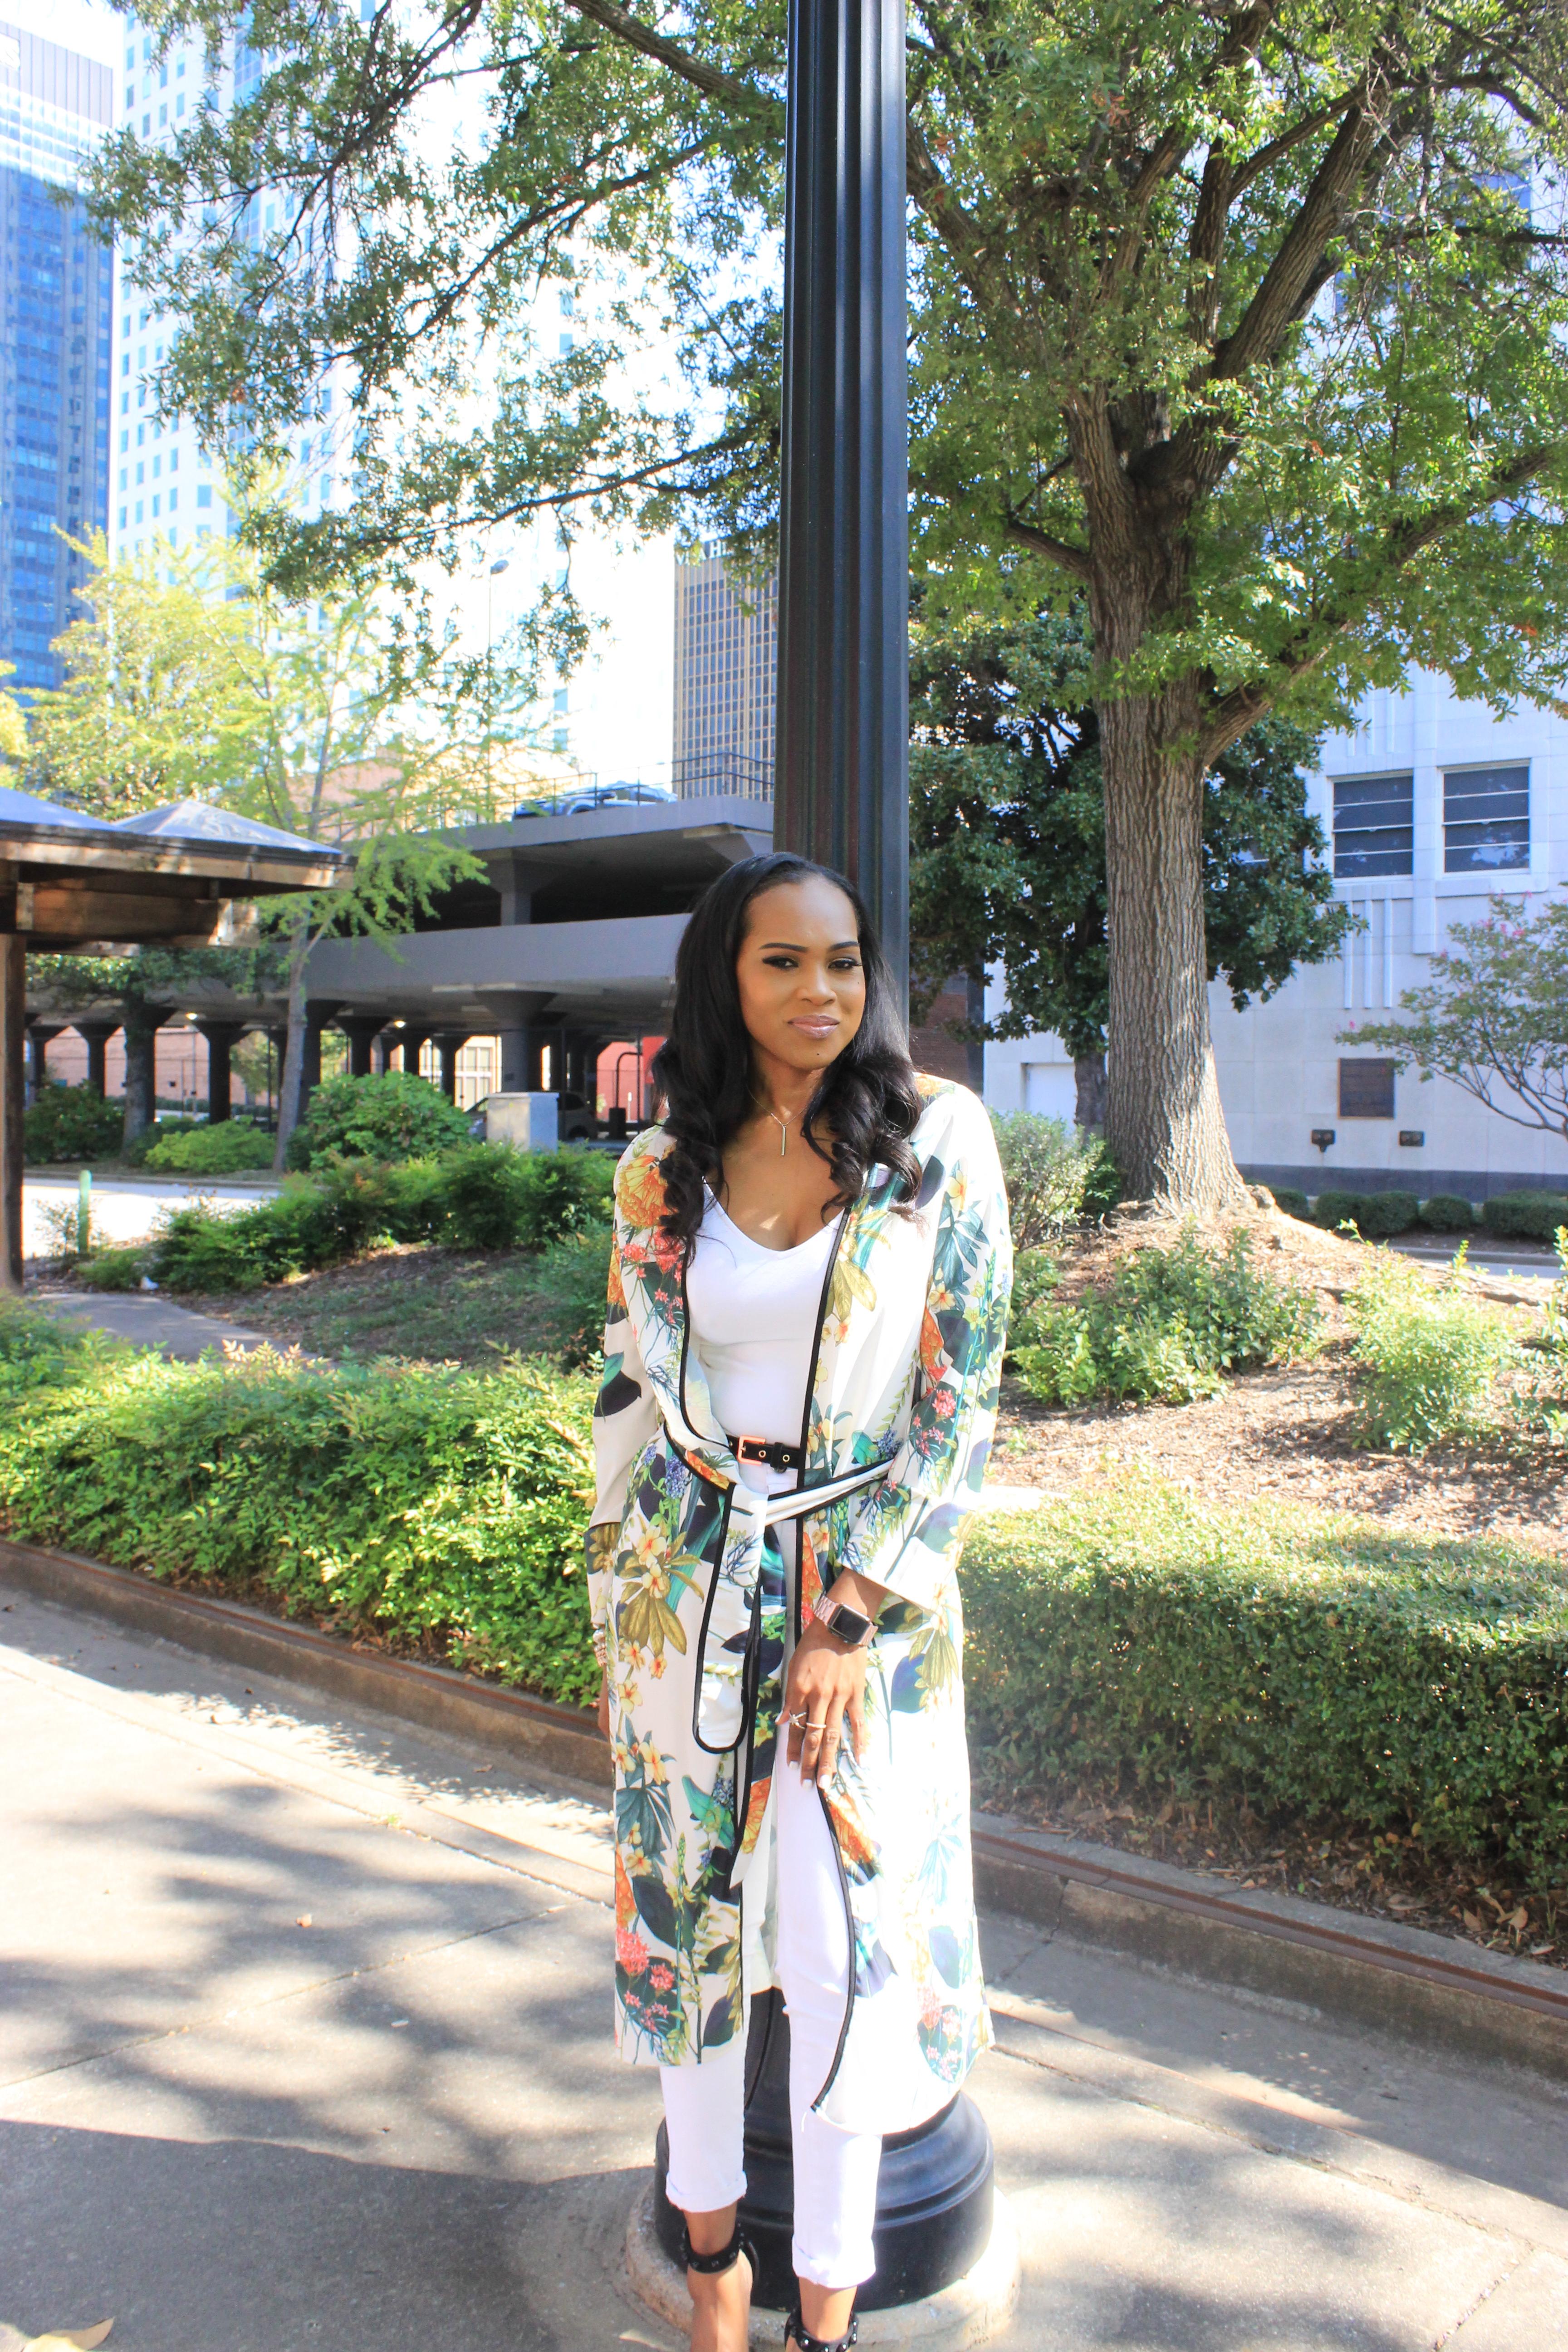 Style-files-White-Civil-Skinny-Jeans-forever-21-white-bodysuit-shein-white-floral-Open Front Longline Kimono -Cape-Ribbon-black-Meg Ankle Strap Beaded Heel-Cape-Ribbon-studded-ankle-strap-sandals-oohlalablog-6